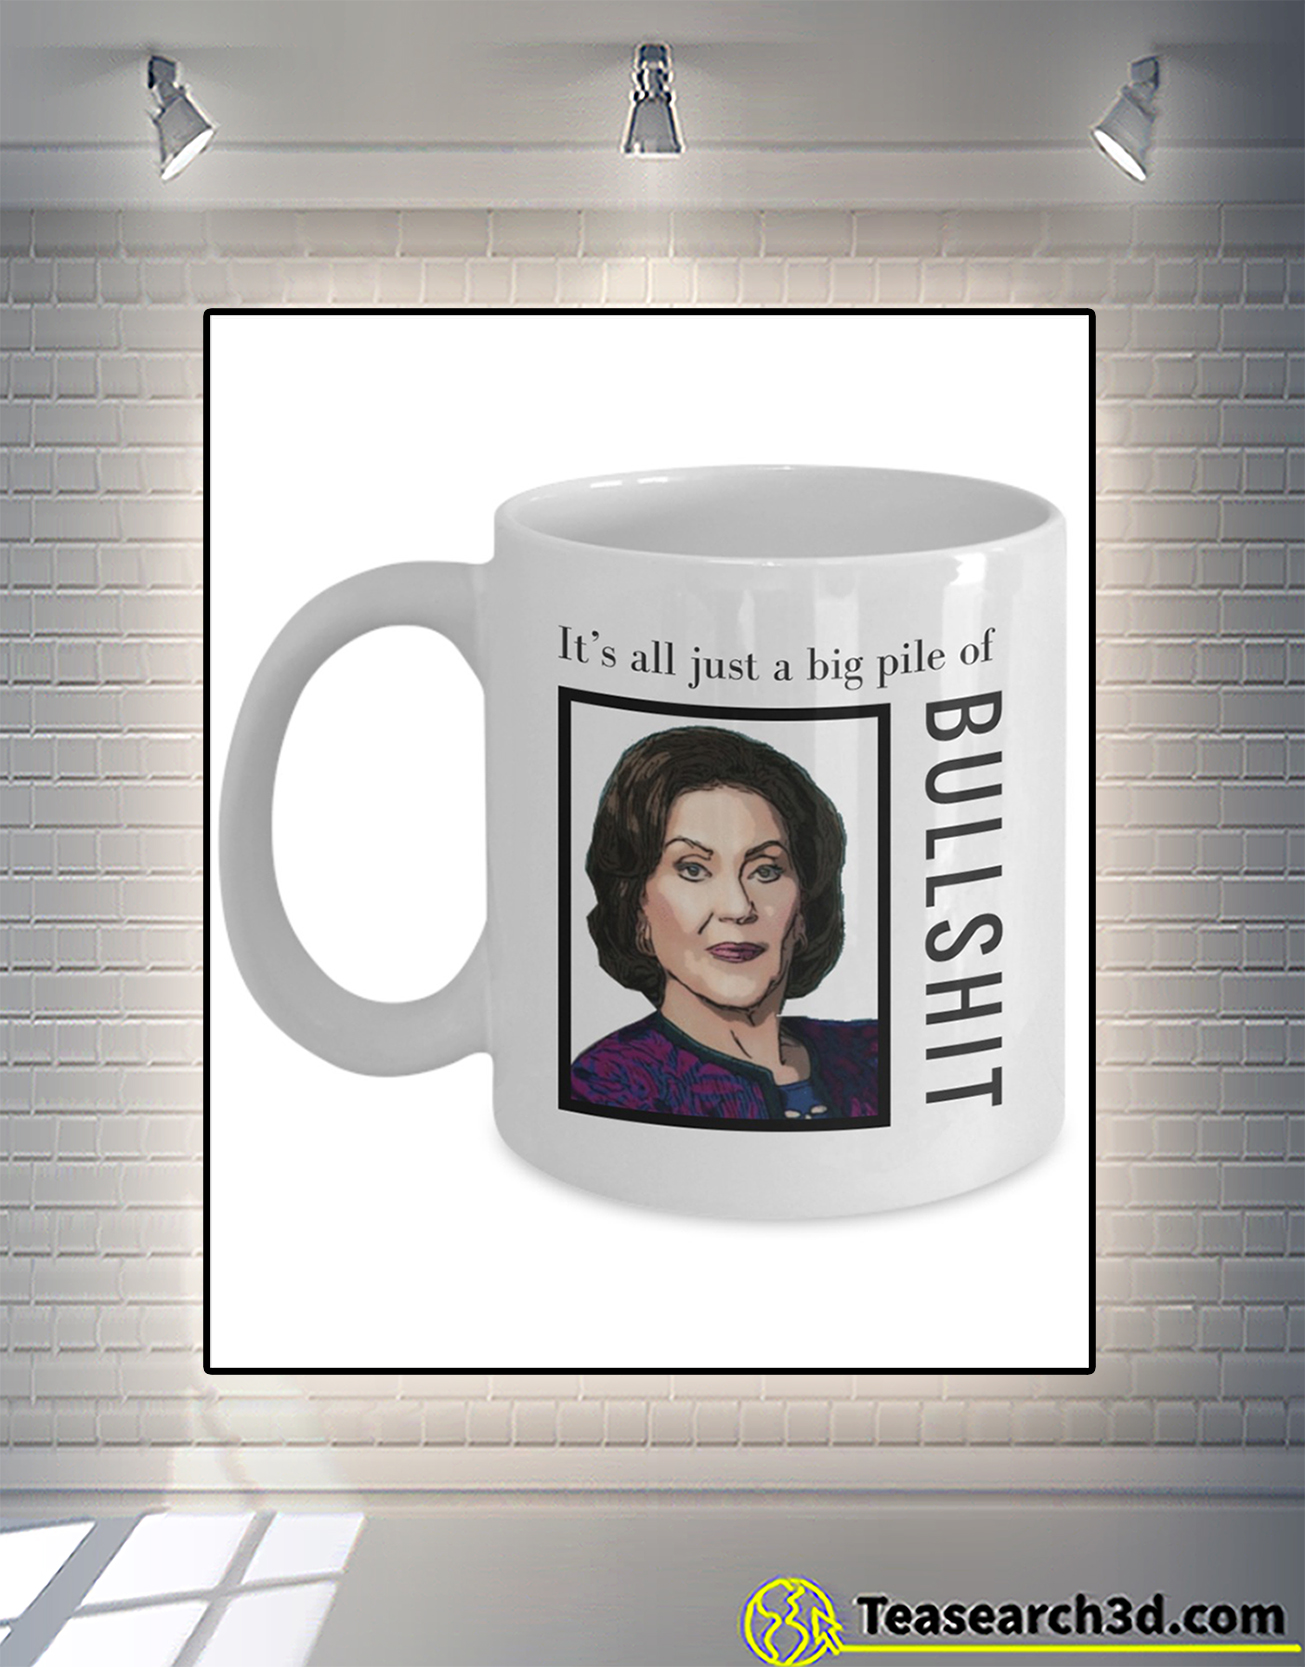 Gilmore girls It's all just a big pile of bullshit mug 2